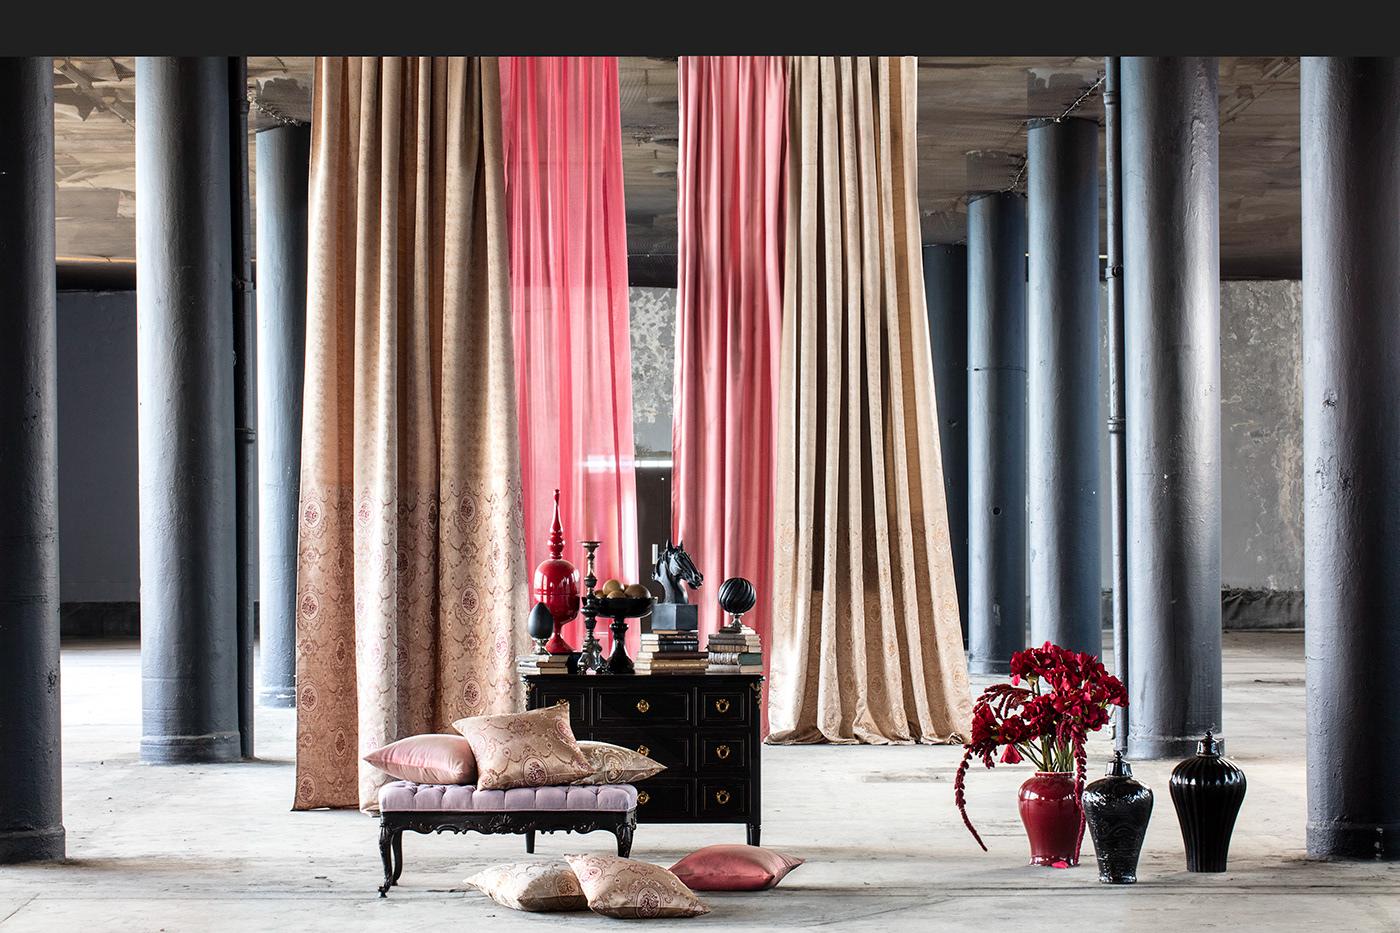 perde curtain home textile Ev Tekstili nevresim mobilya still life Life Style